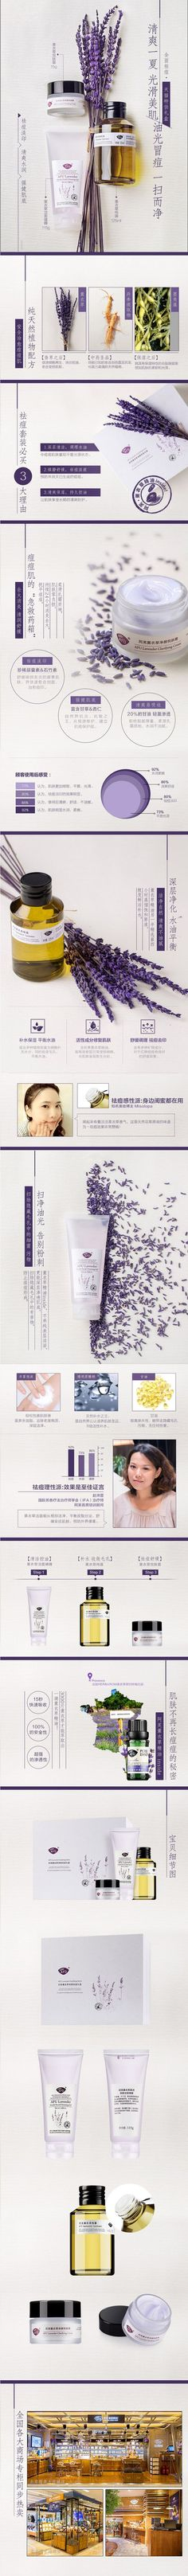 Packaging / cosmetics: